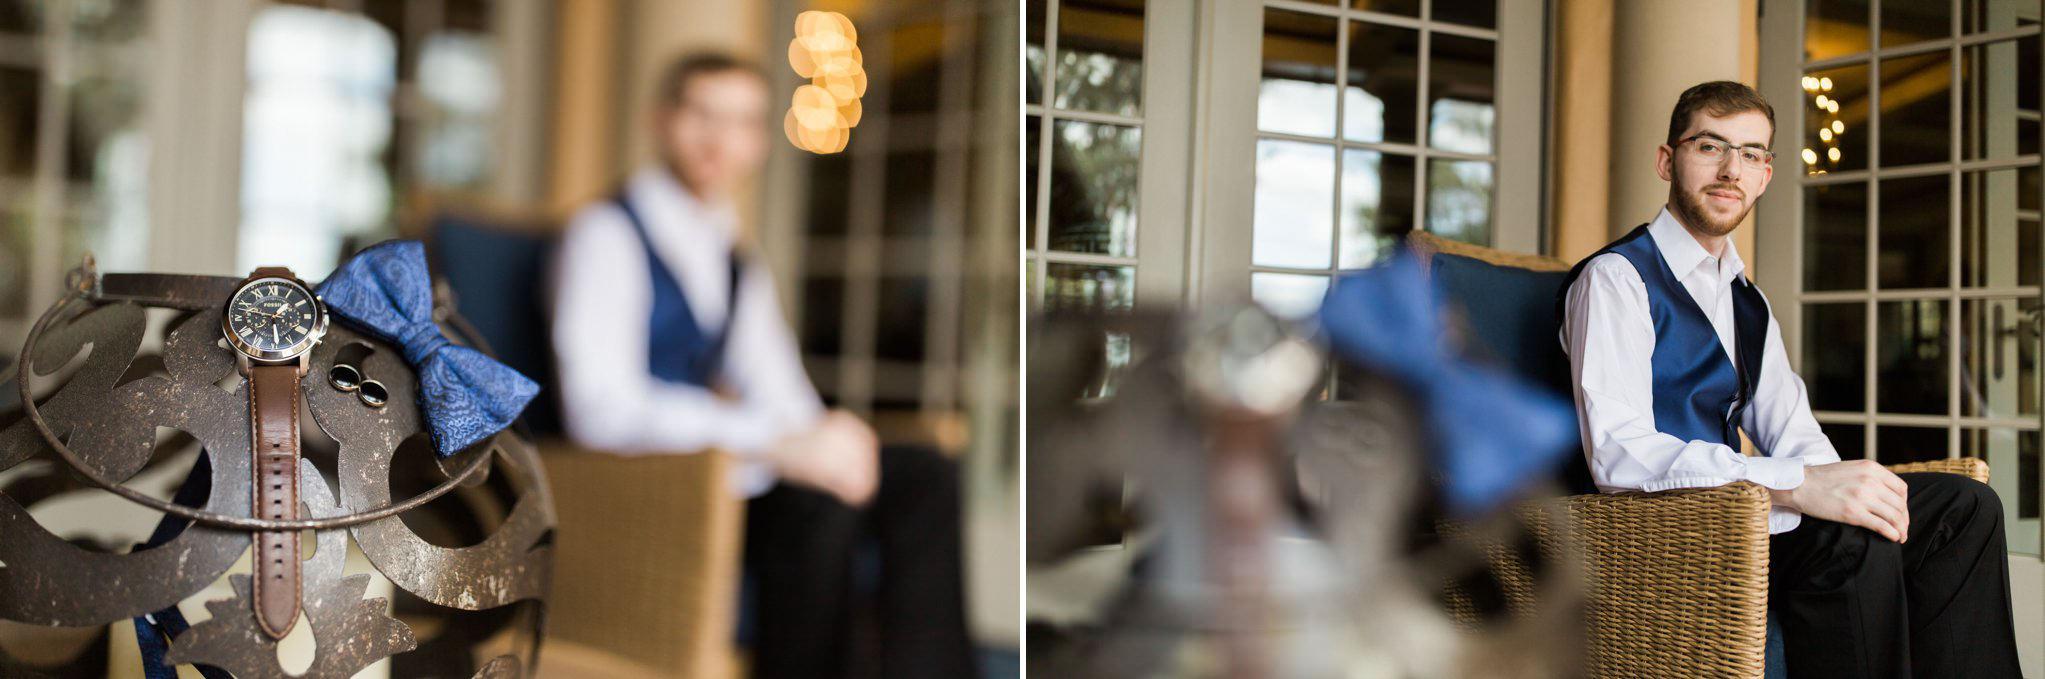 Rollins Chapel + Orlando Science Center Gay LGBT Dinosaur Themed Wedding Adam + Craig 2.jpg